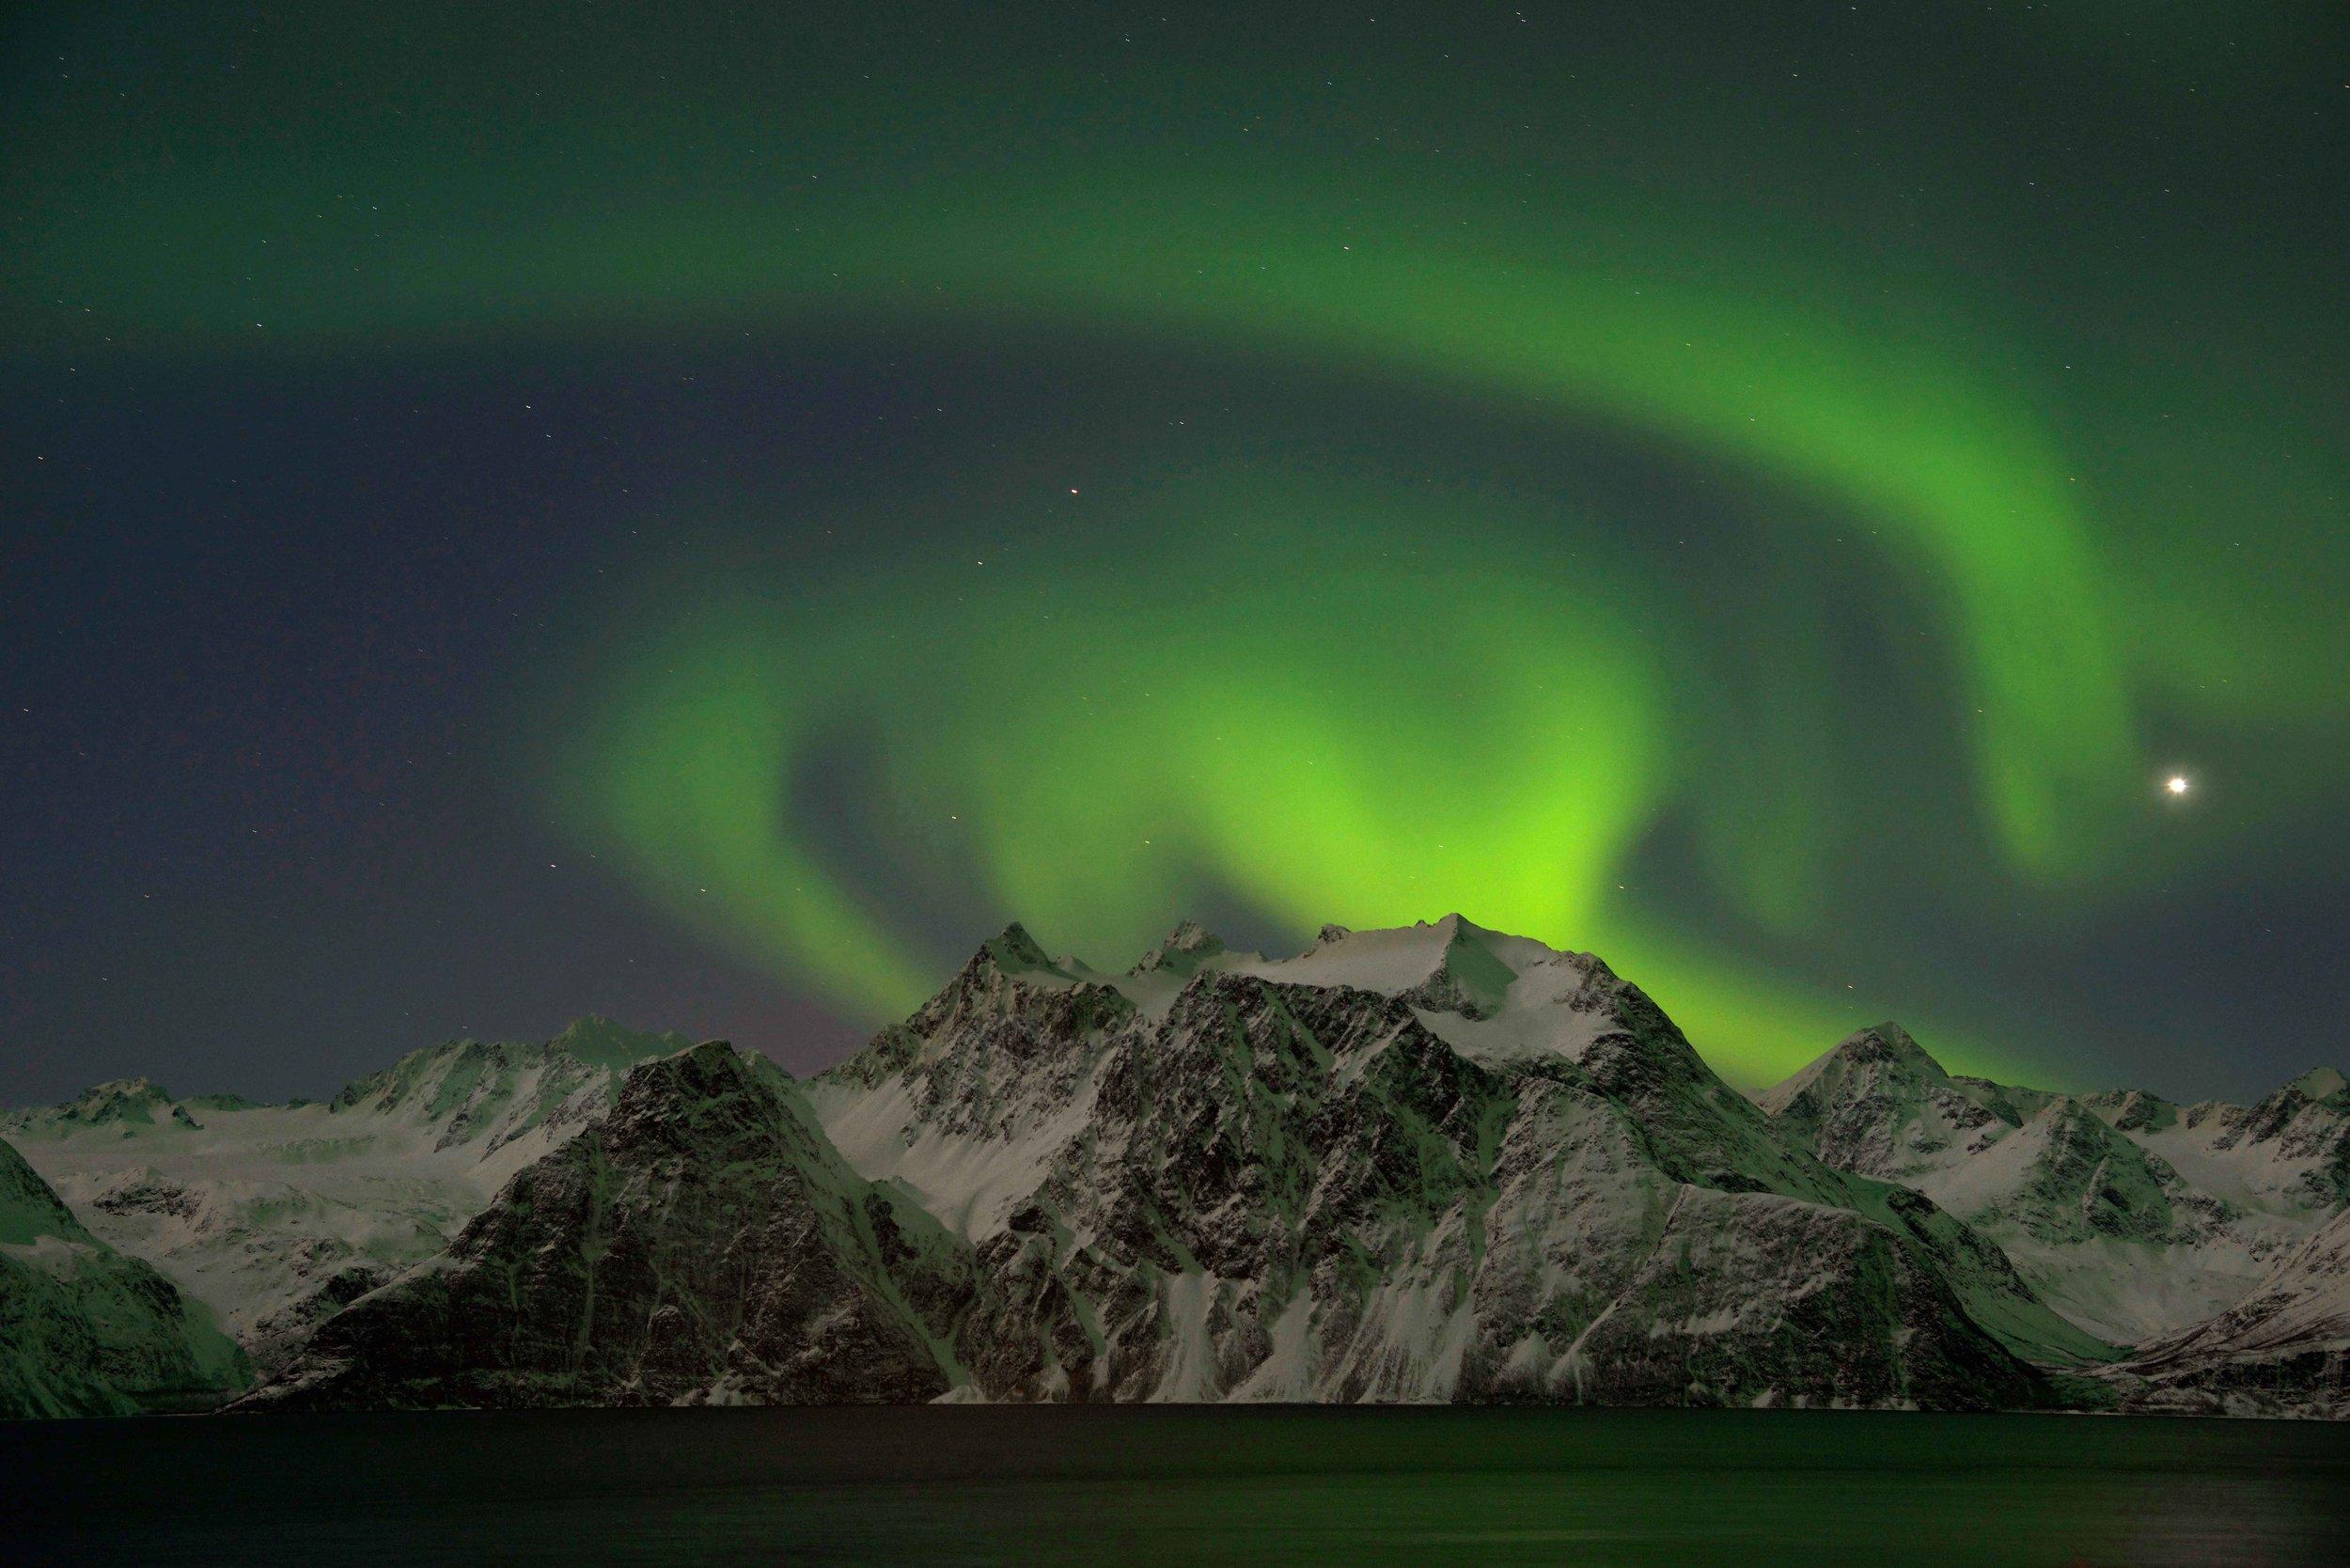 Northern Lights, Aurora Borealis, Lyngen Fjord, shot from Lyngen Lodge, Norway. Image©thingstodot.com